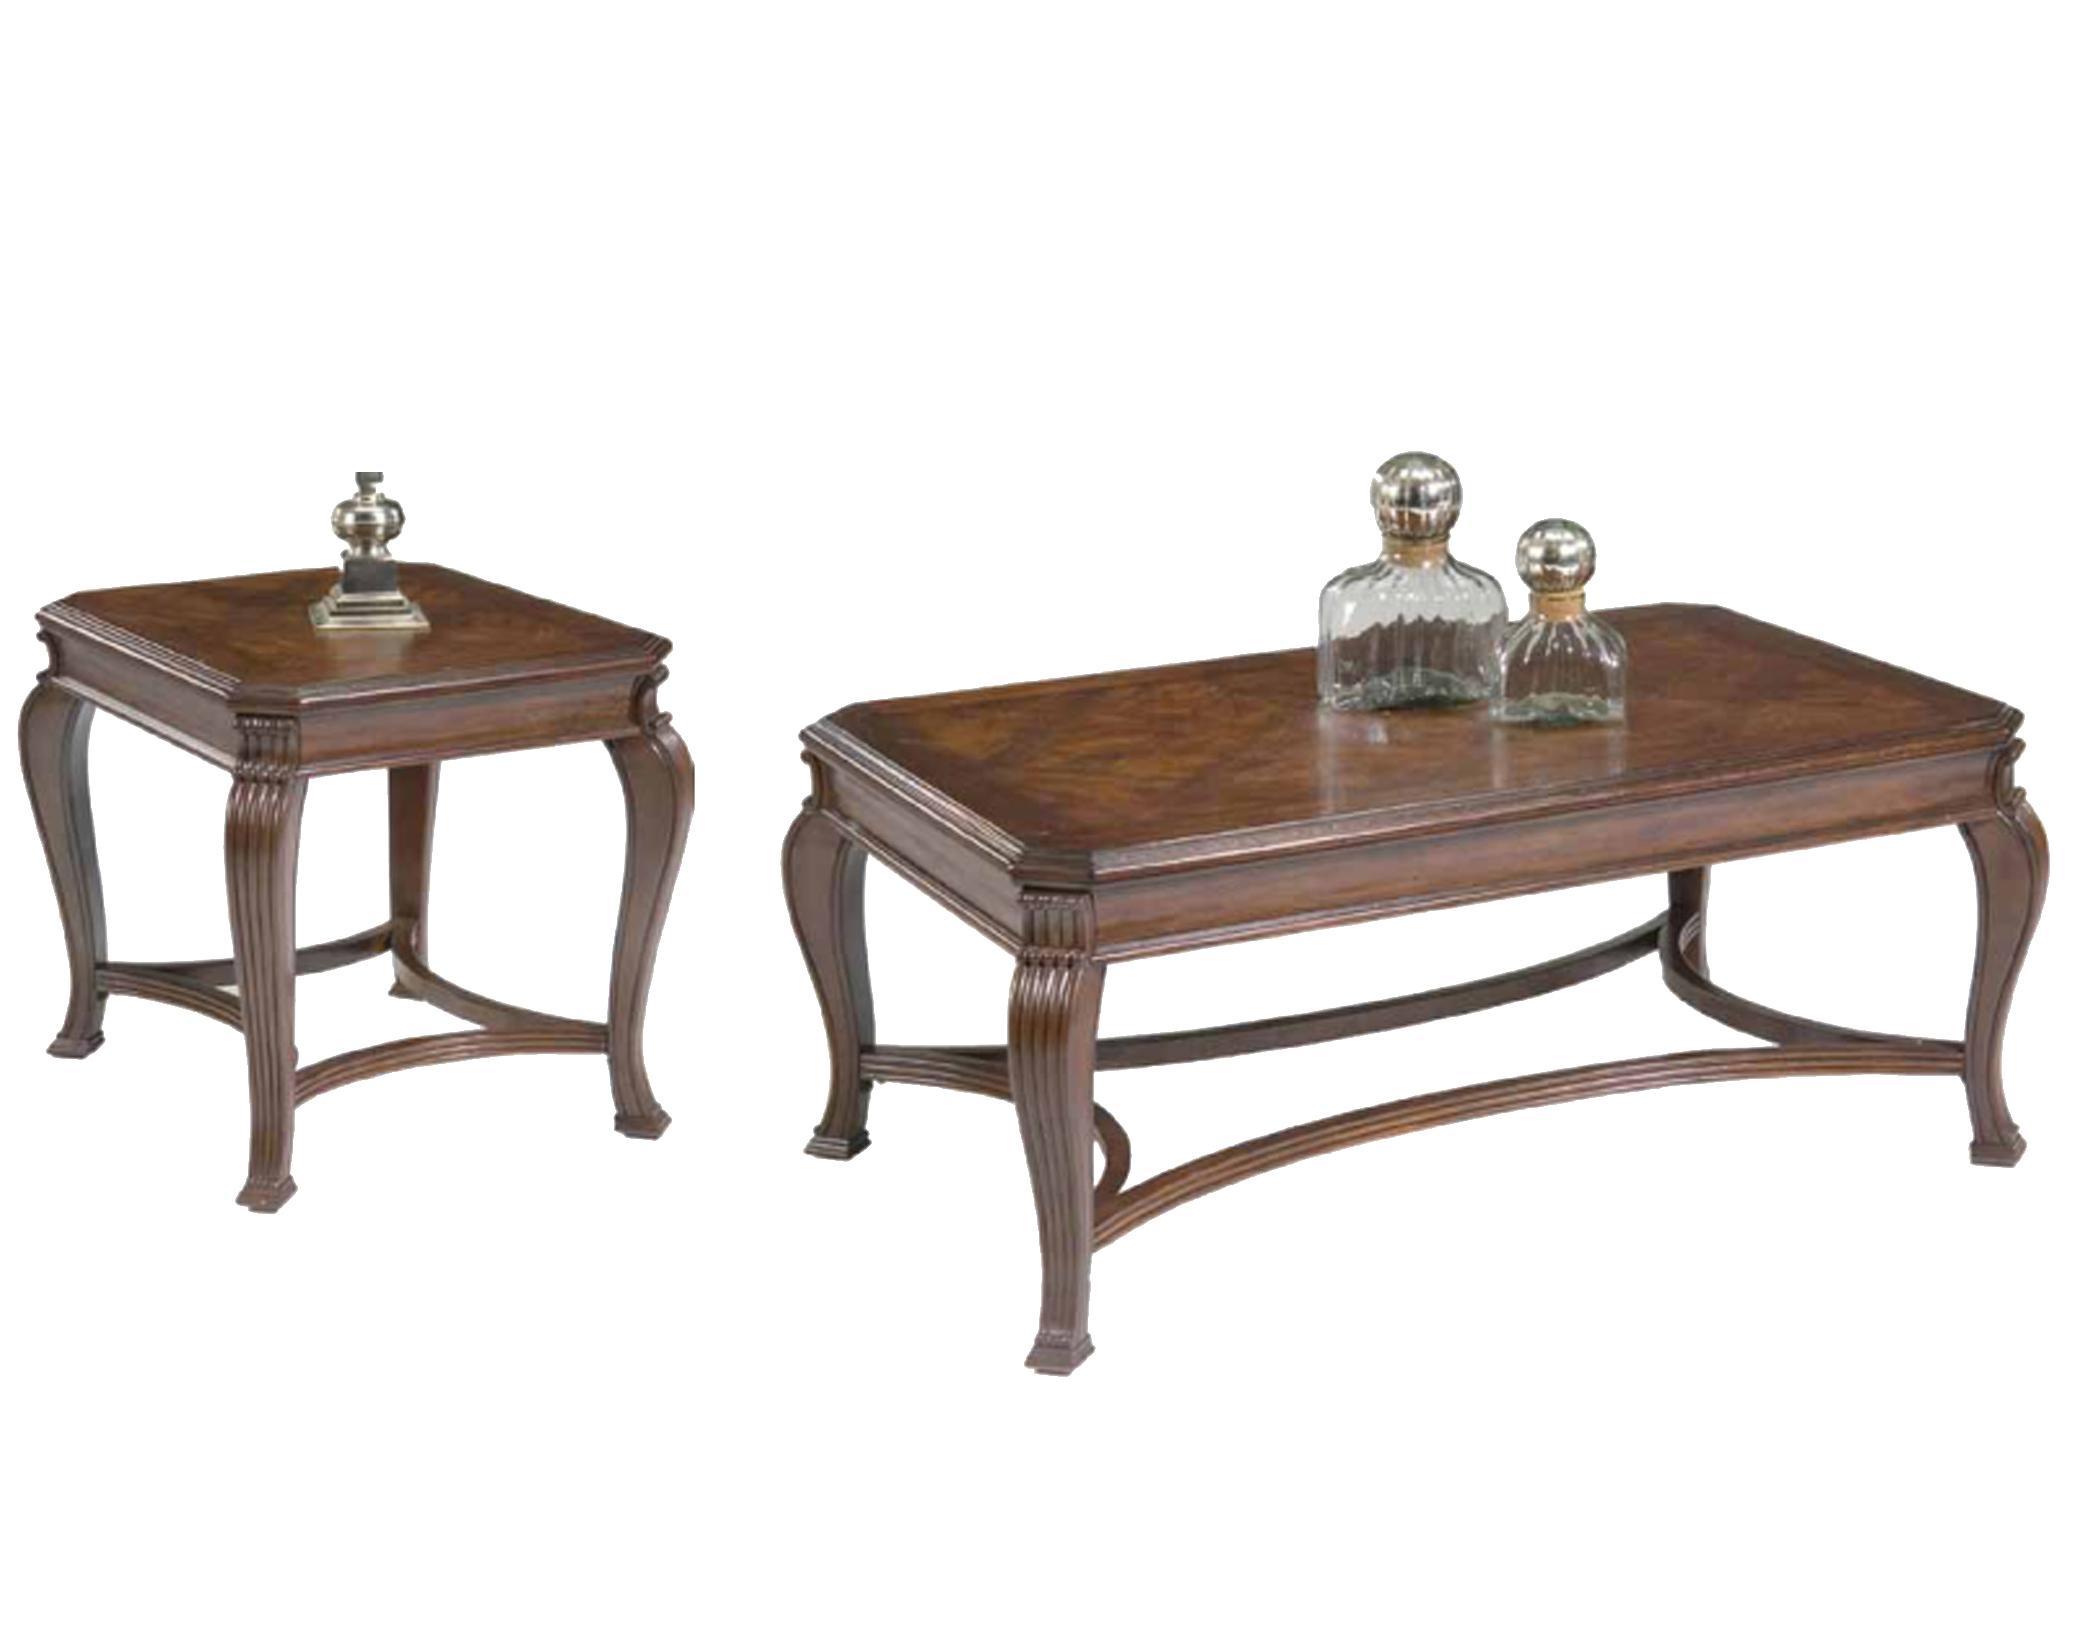 Liberty Furniture Ellington 3 Piece Occasional Table Set - Item Number: 741-OT1010+2x20